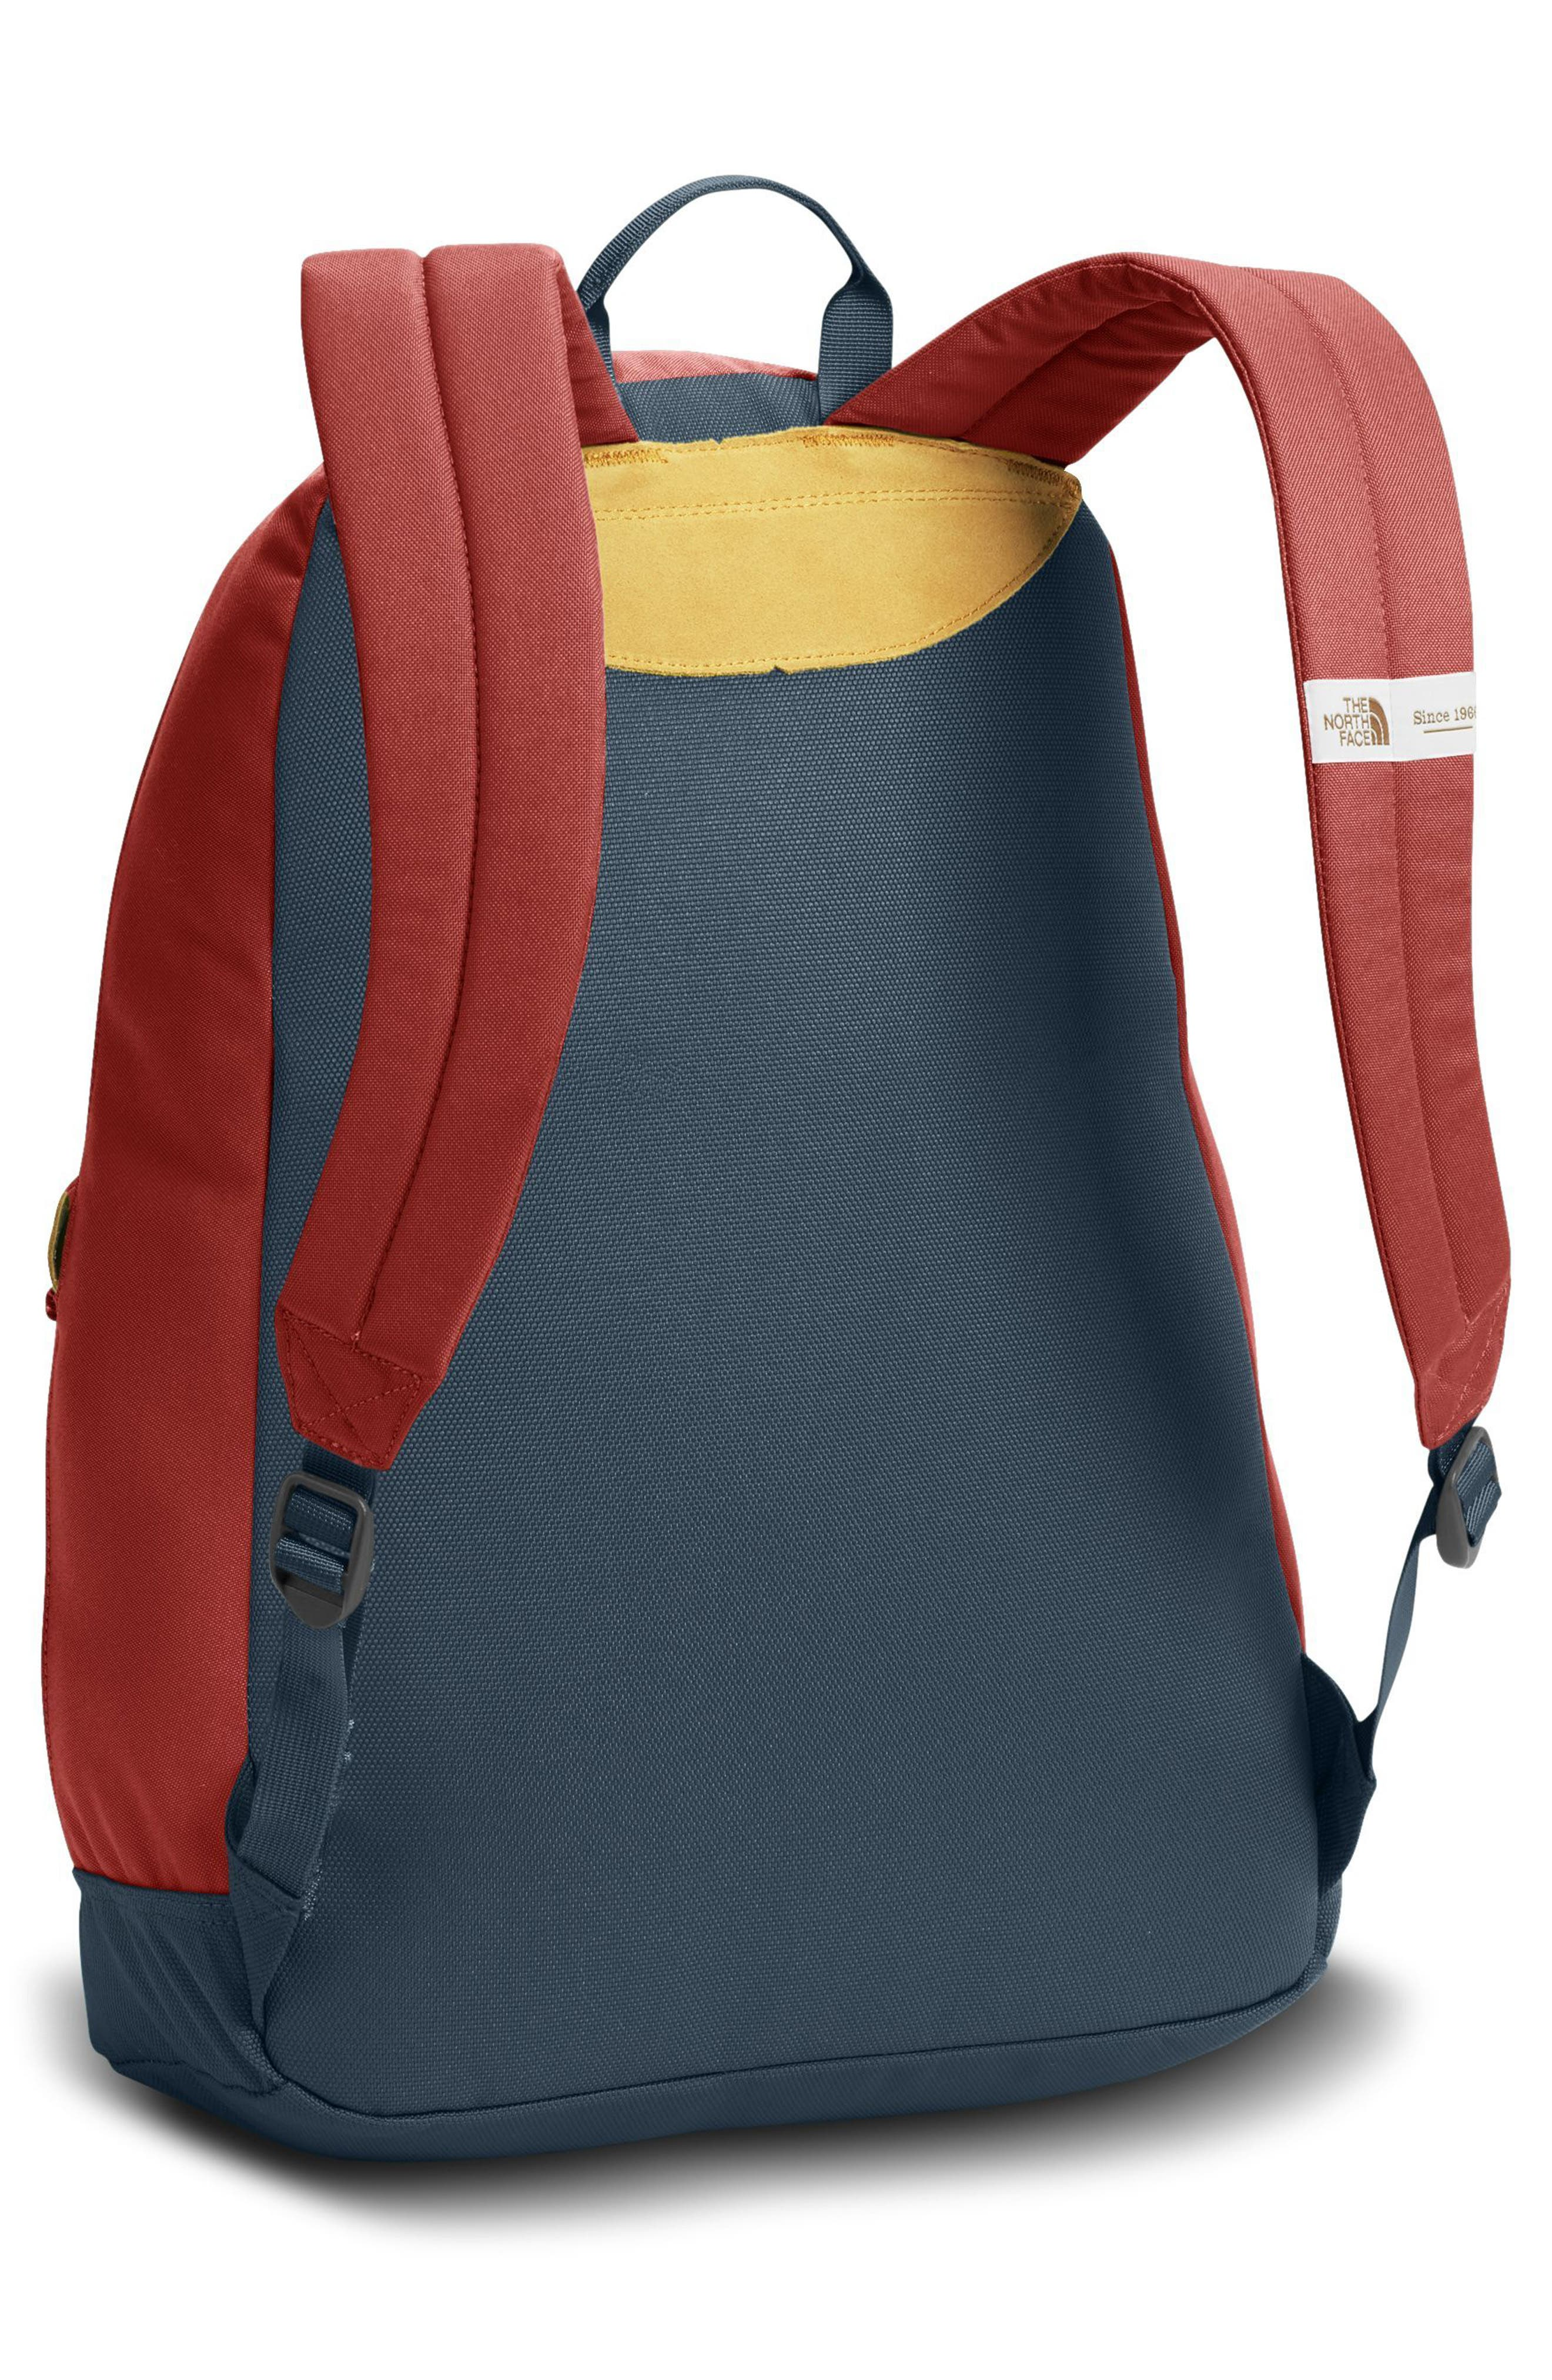 Berkeley Backpack,                             Alternate thumbnail 2, color,                             Bossa Nova Red/ Conquer Blue